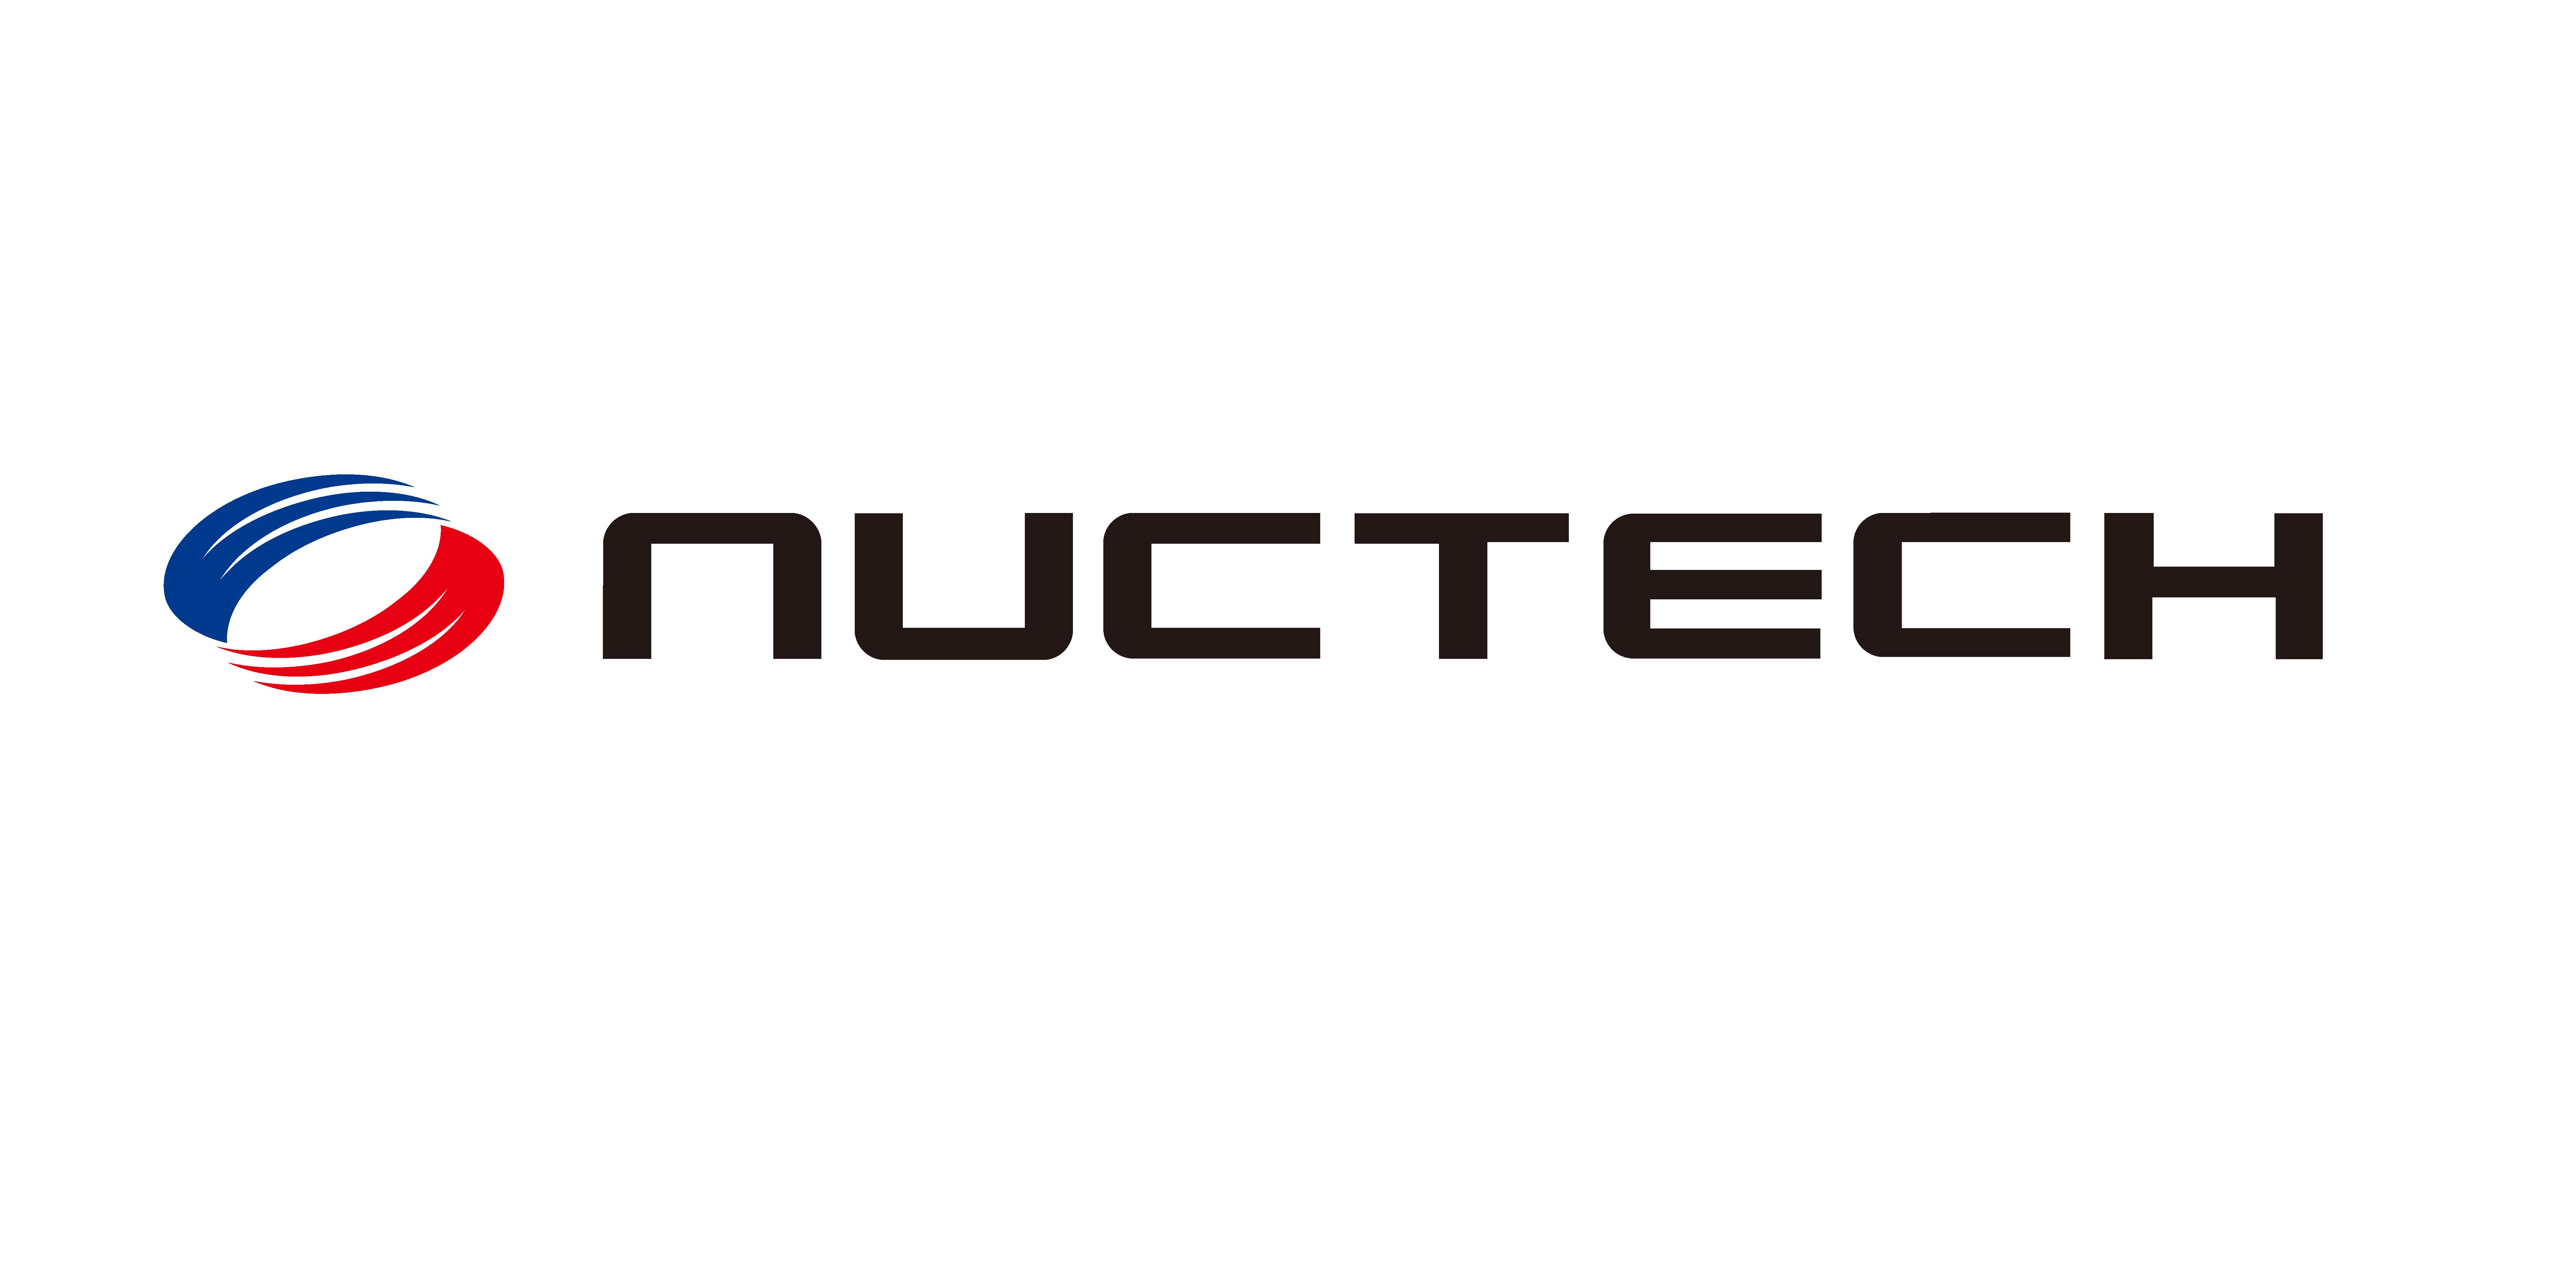 Nutech Company Limited